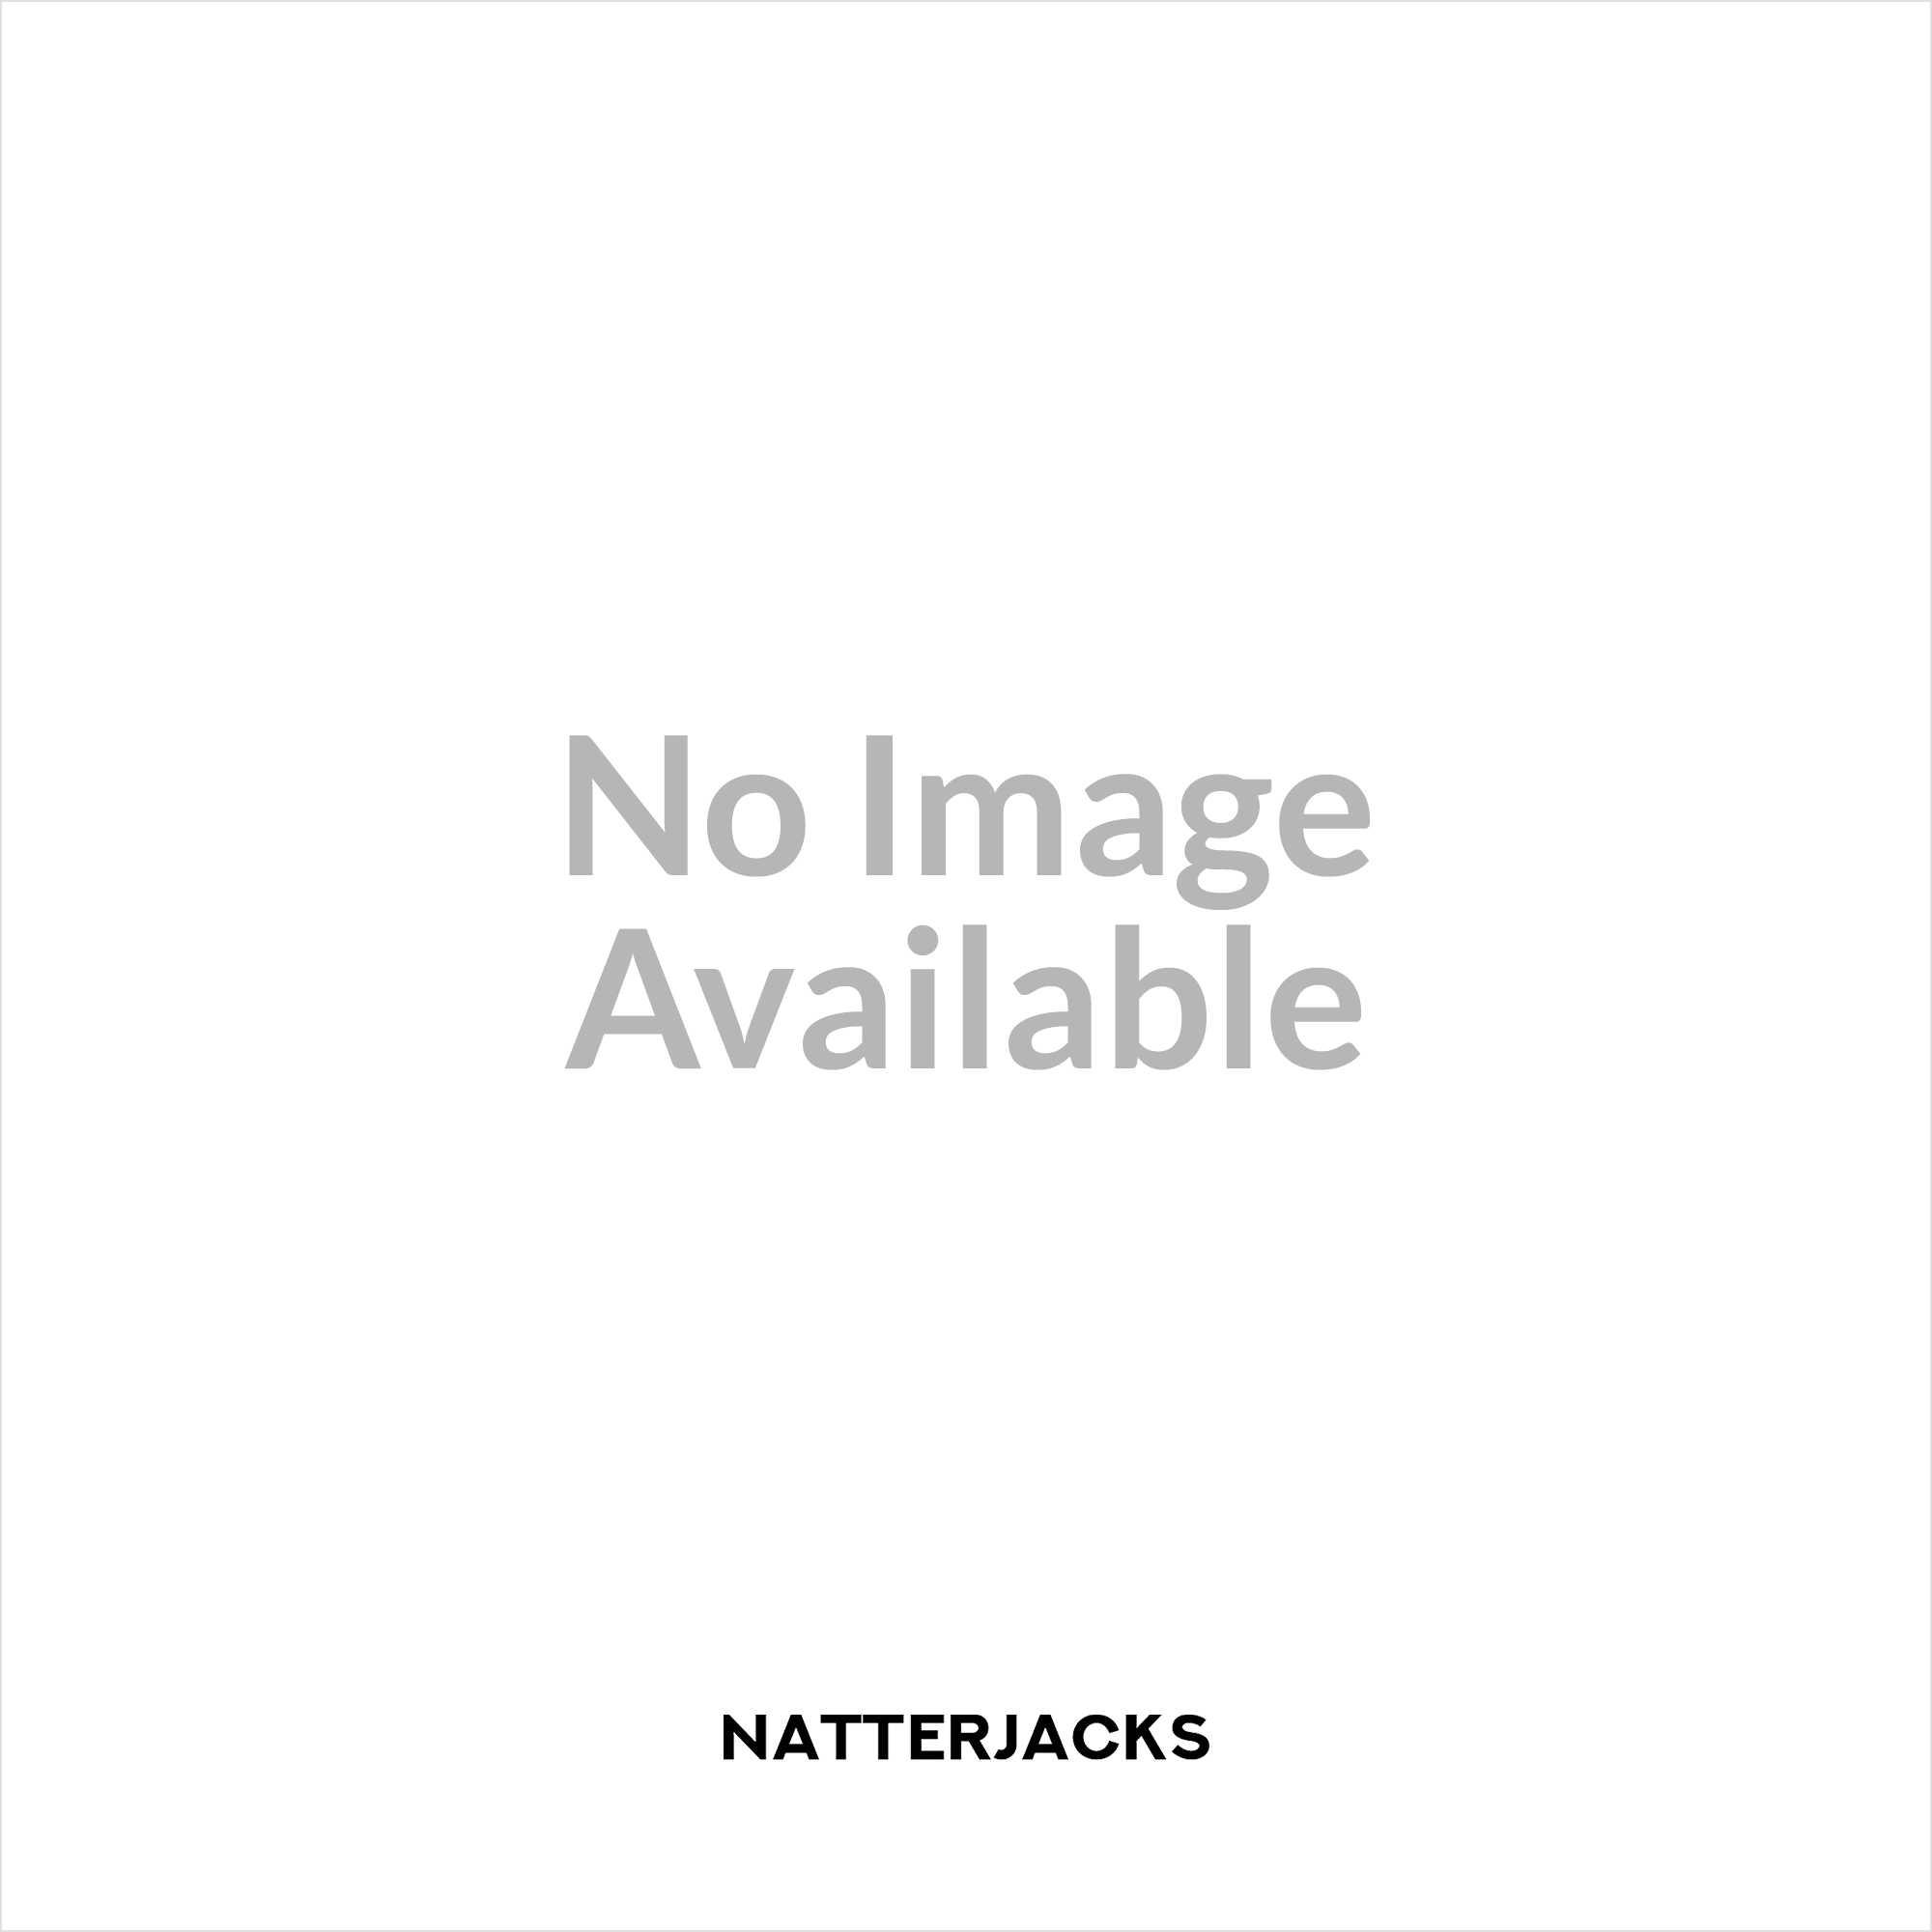 3c65b6c2a793 Nike SB Ishod Wair Pro Dunk